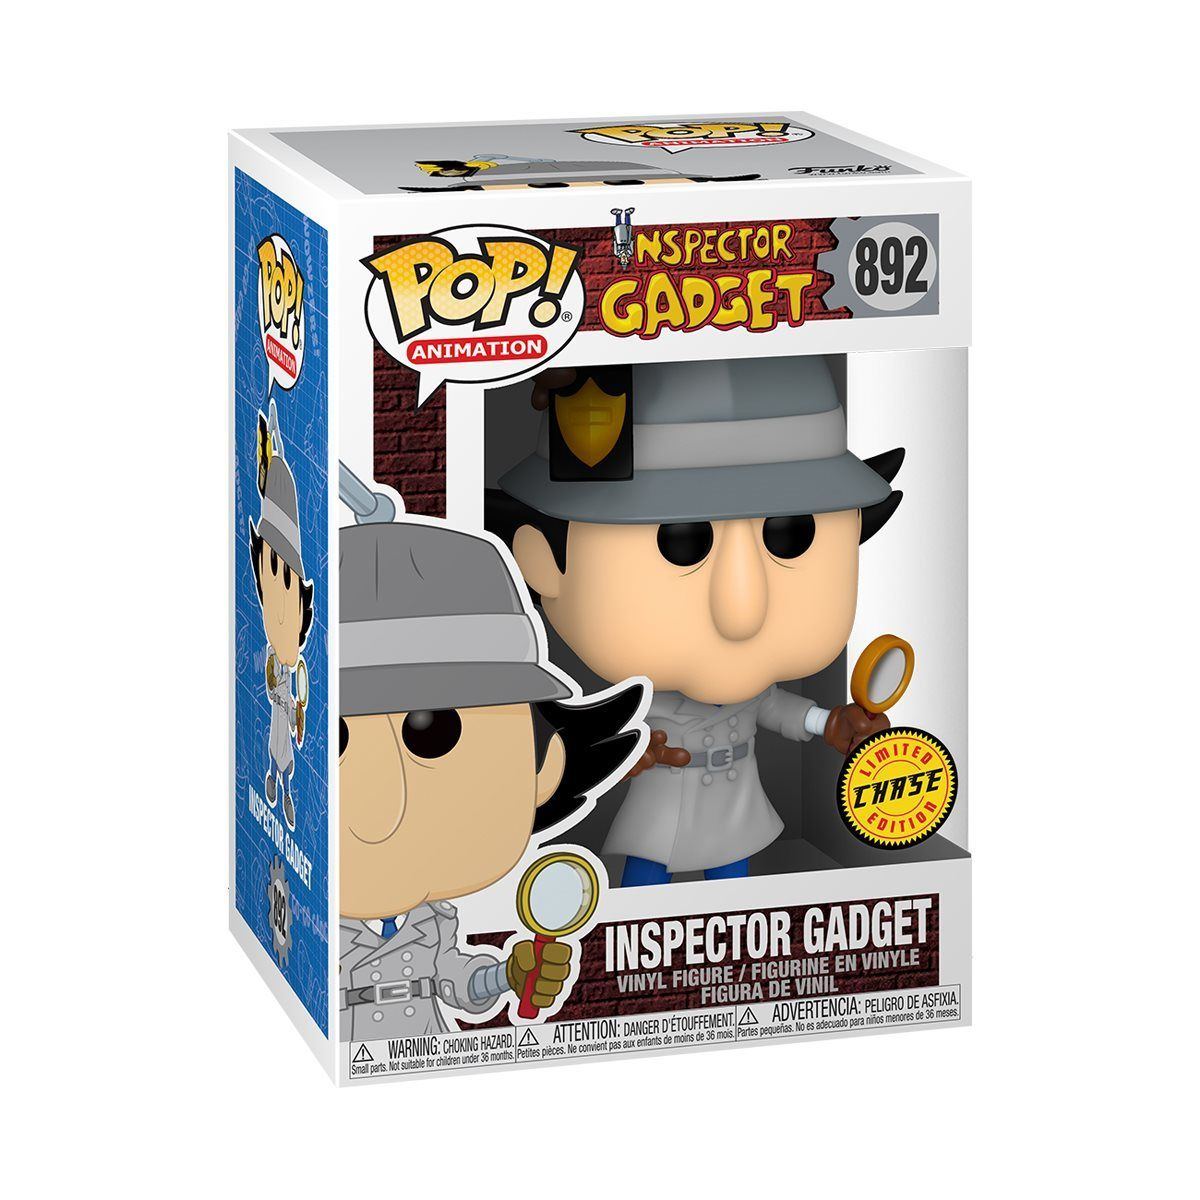 [PRE-ORDER] Funko POP! Inspector Gadget - Inspector Gadget Vinyl Figure #892